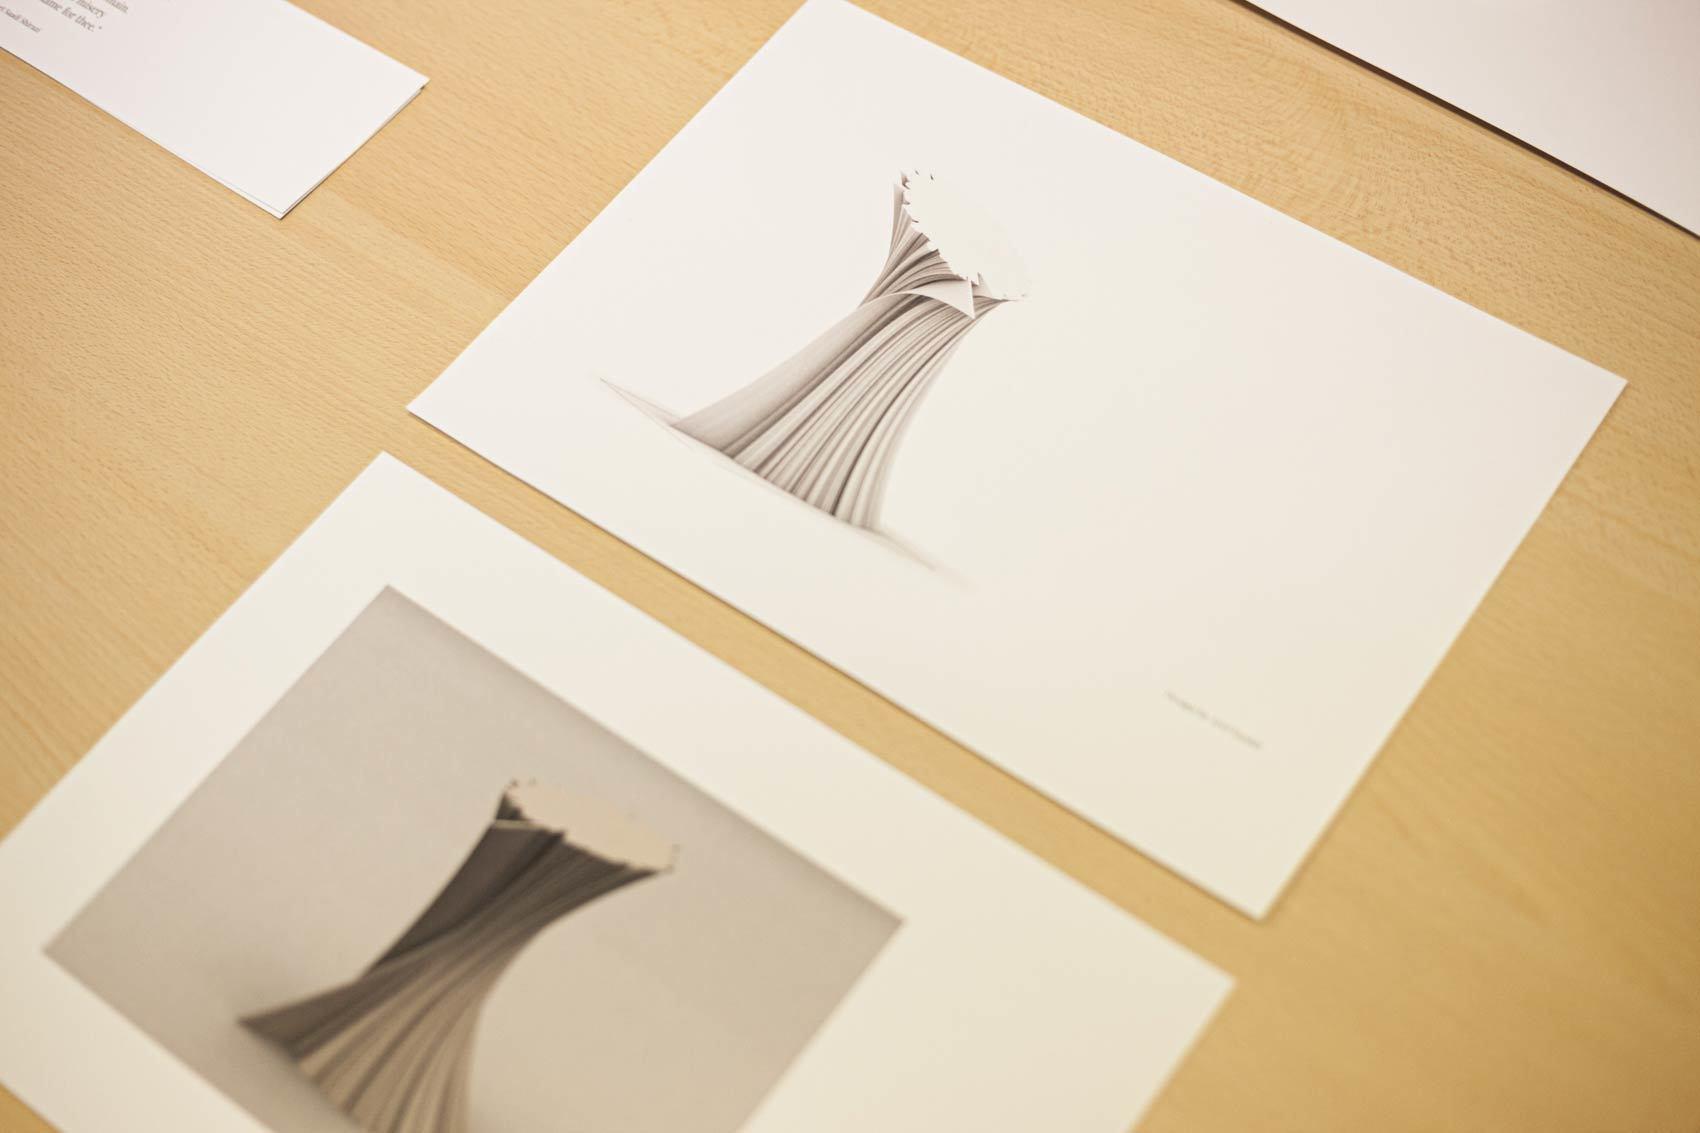 Aref Dashti - Witte Anjer Prijs ontwerpconcept 2020